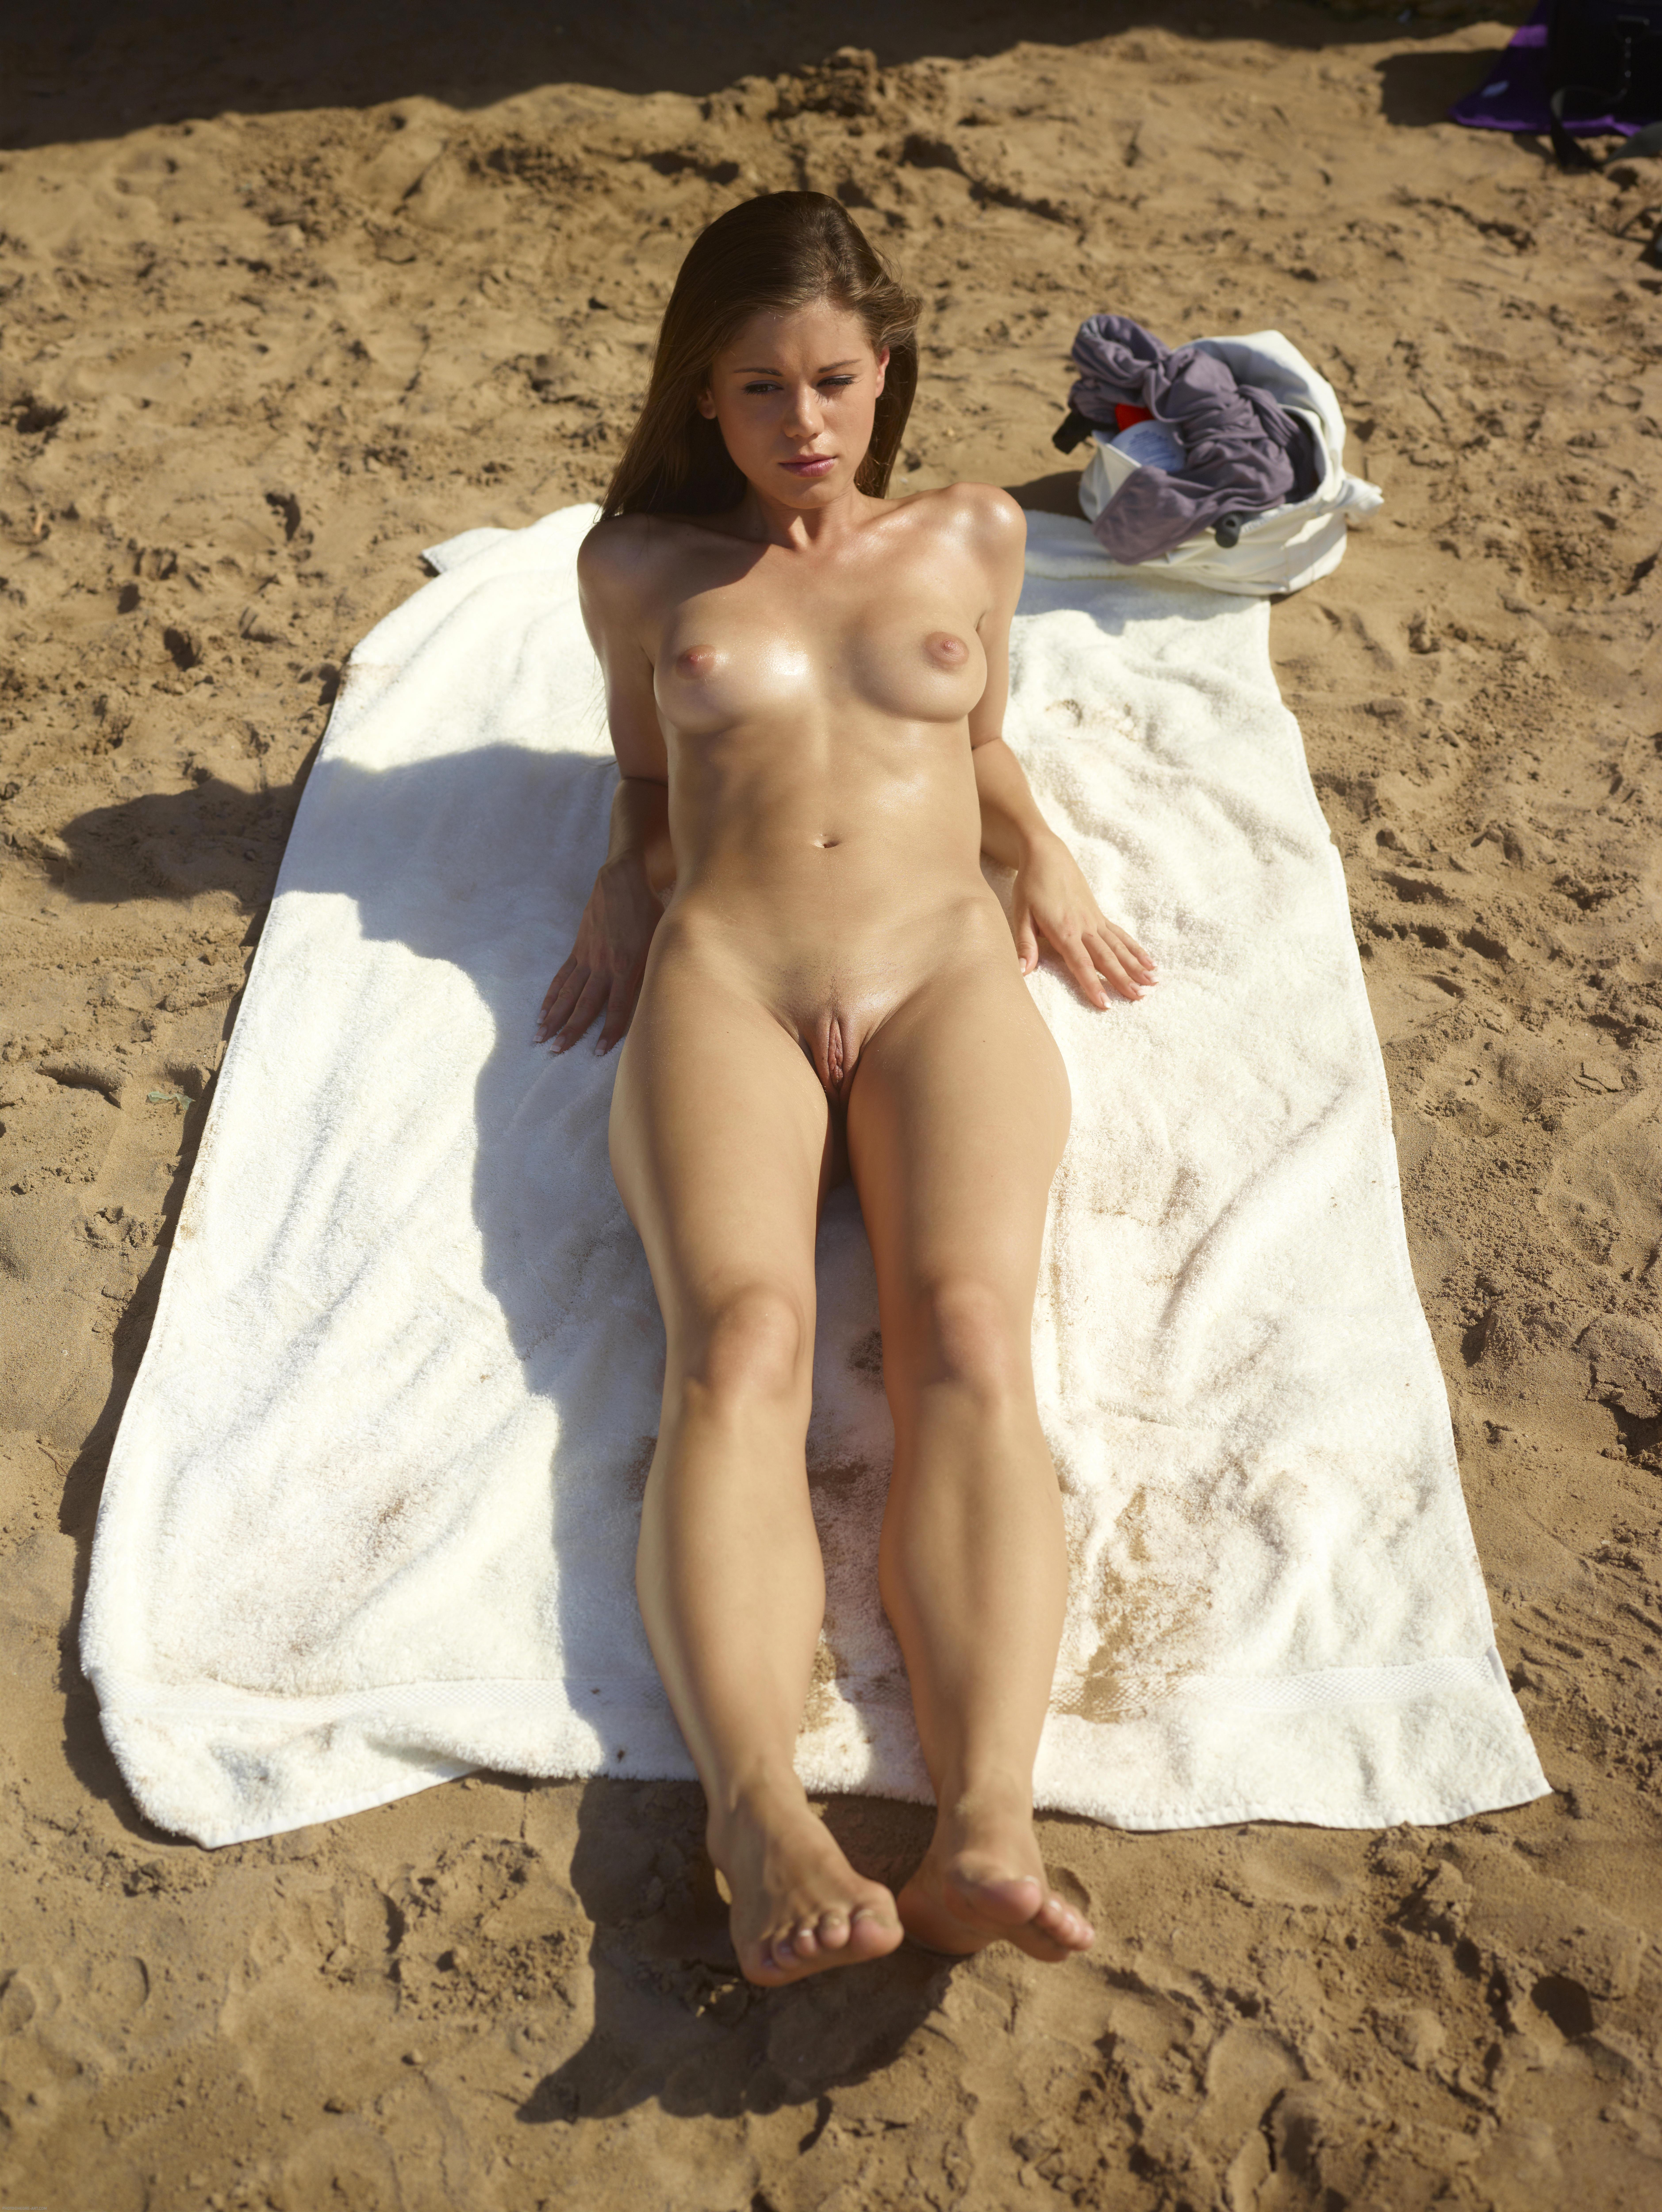 turboimagehost.com show-022 porn  Caprice Public Beach 2012 05 23 022 xxxxxl